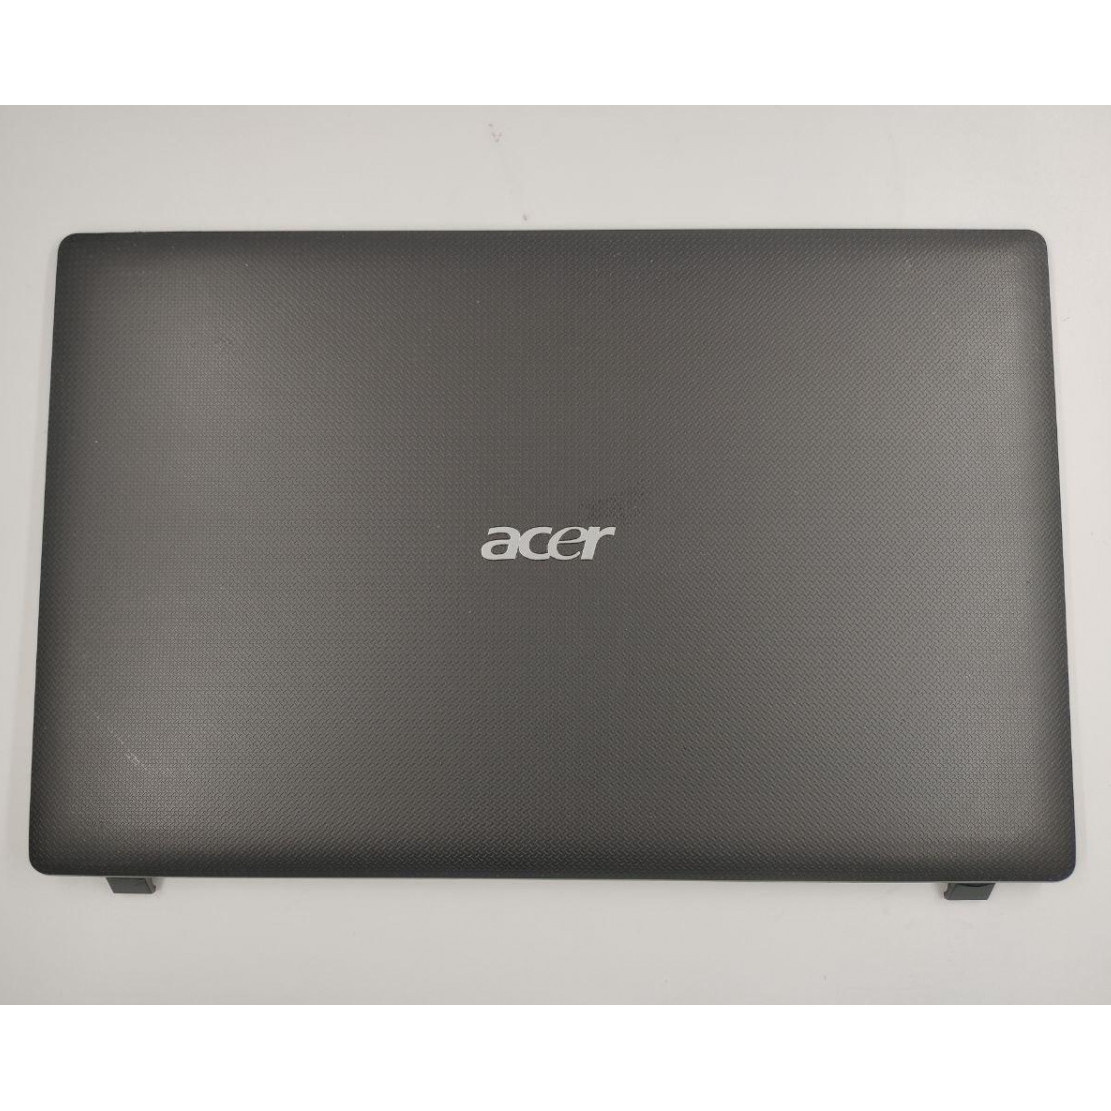 "Кришка матриці для ноутбука Acer Aspire 5733, 5551, 5552, 5741, 5742, 5253, 5250, eMachines E442, E642, 15.6"","